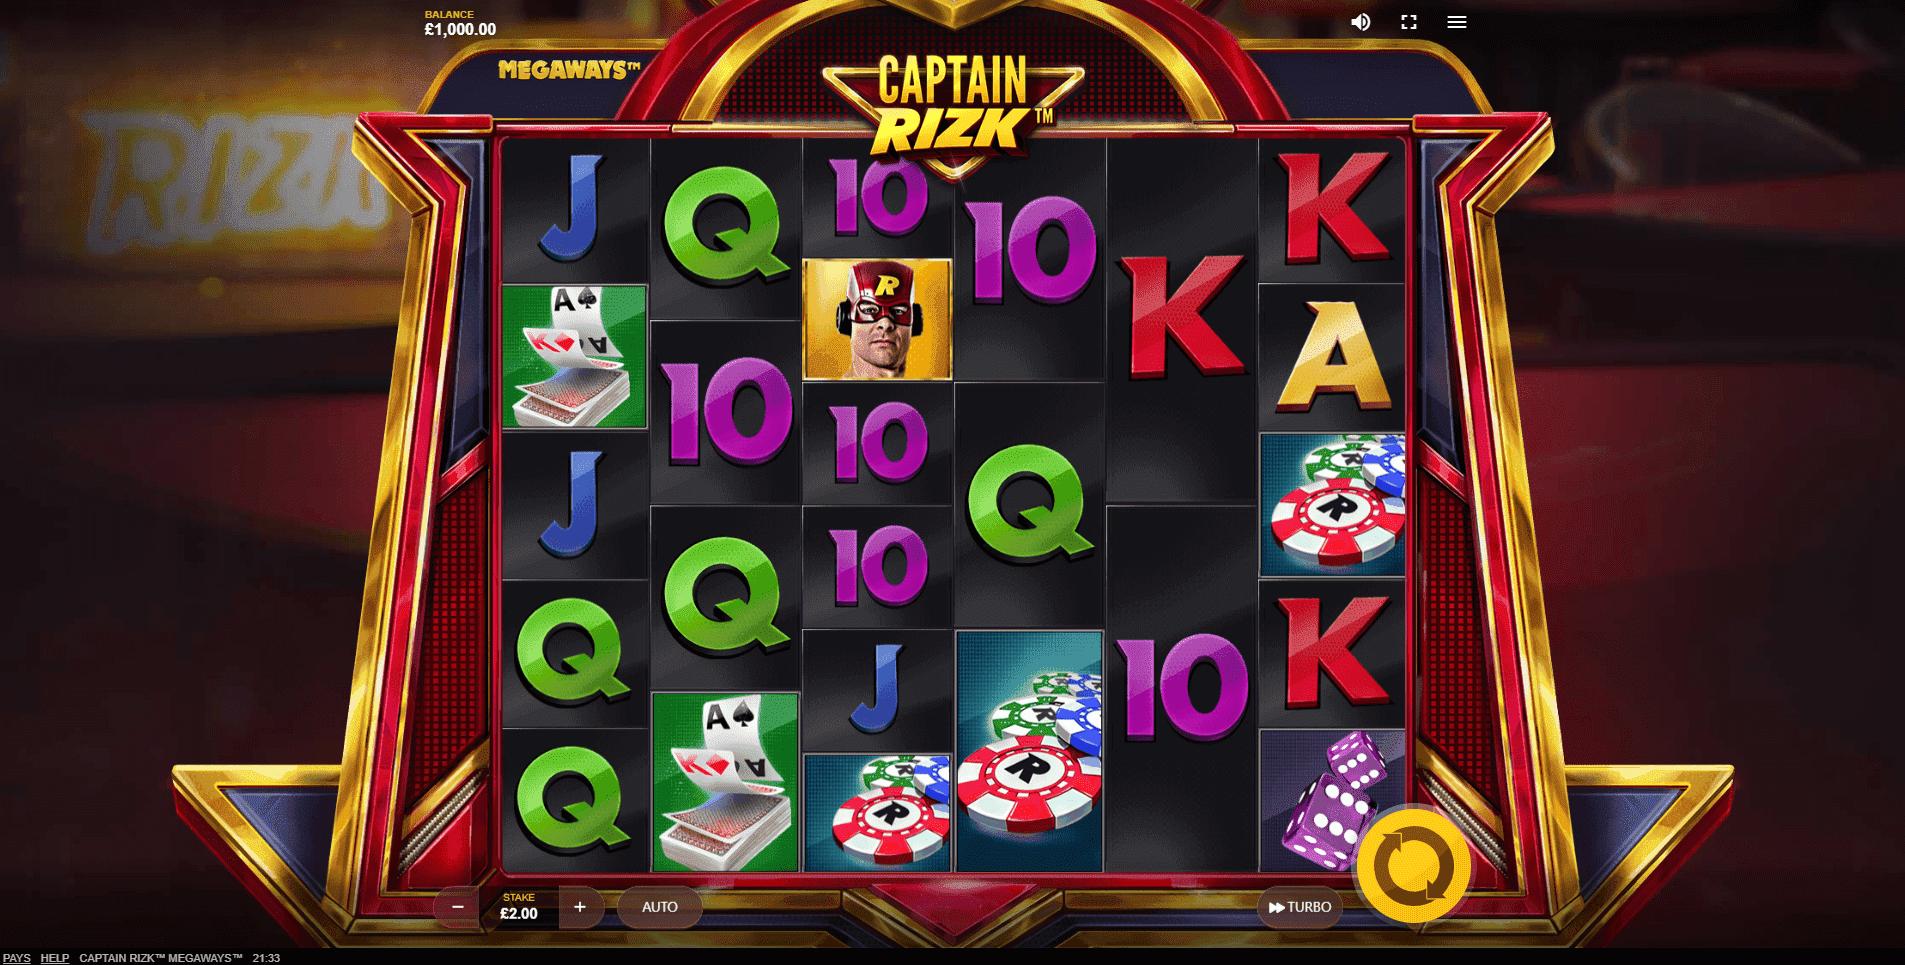 Captain Rizk Megaways slot machine screenshot